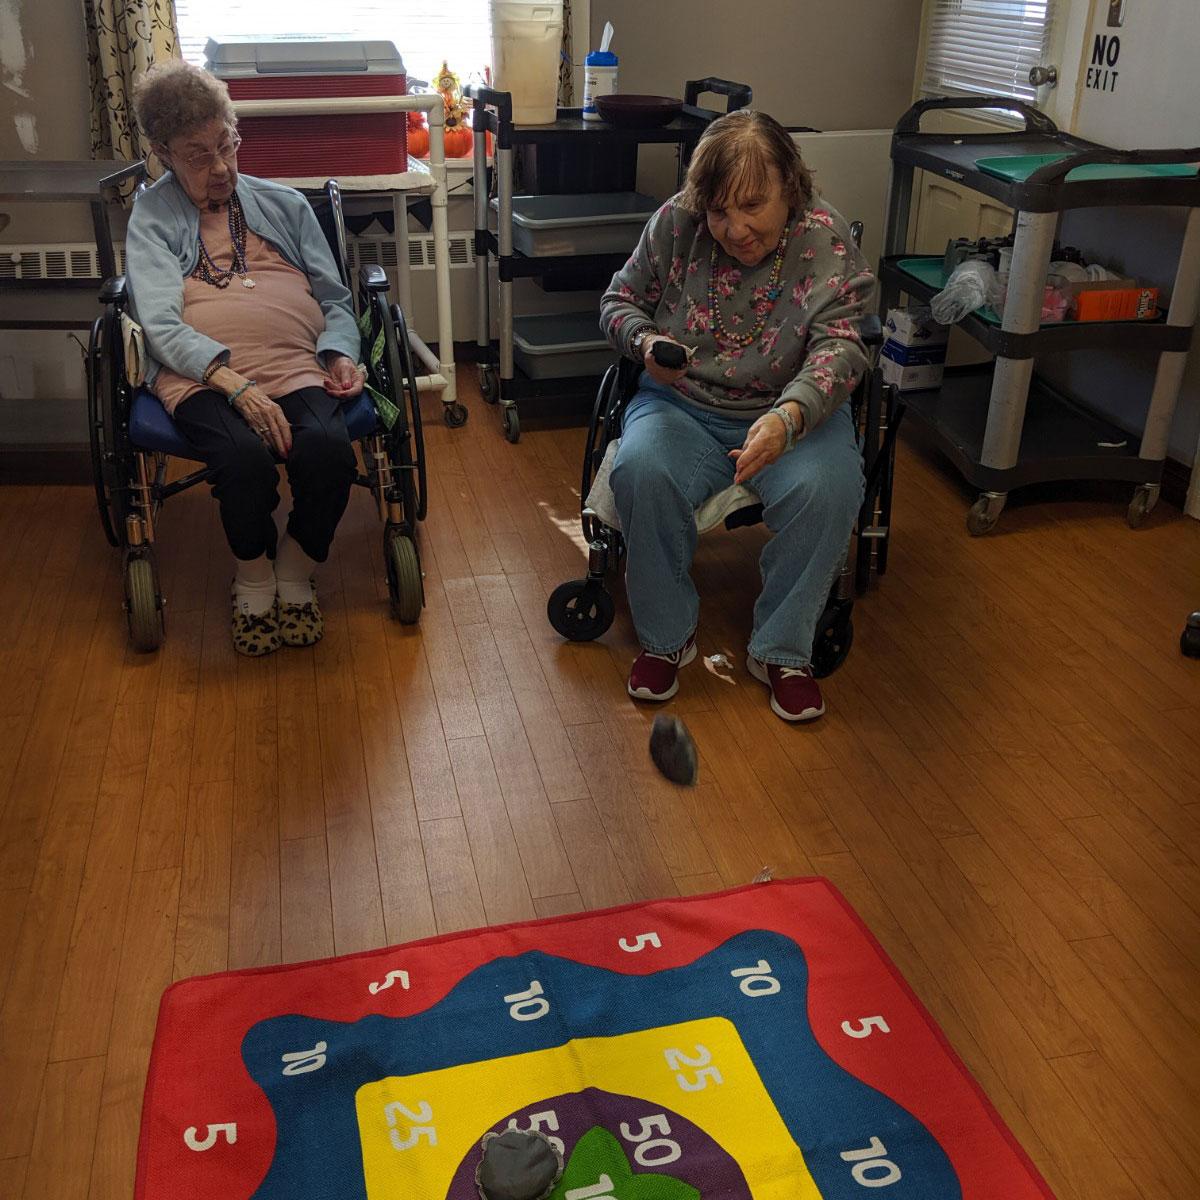 Image of residents playing game at Kadima at Palmyra Nursing and Rehabilitation Facility